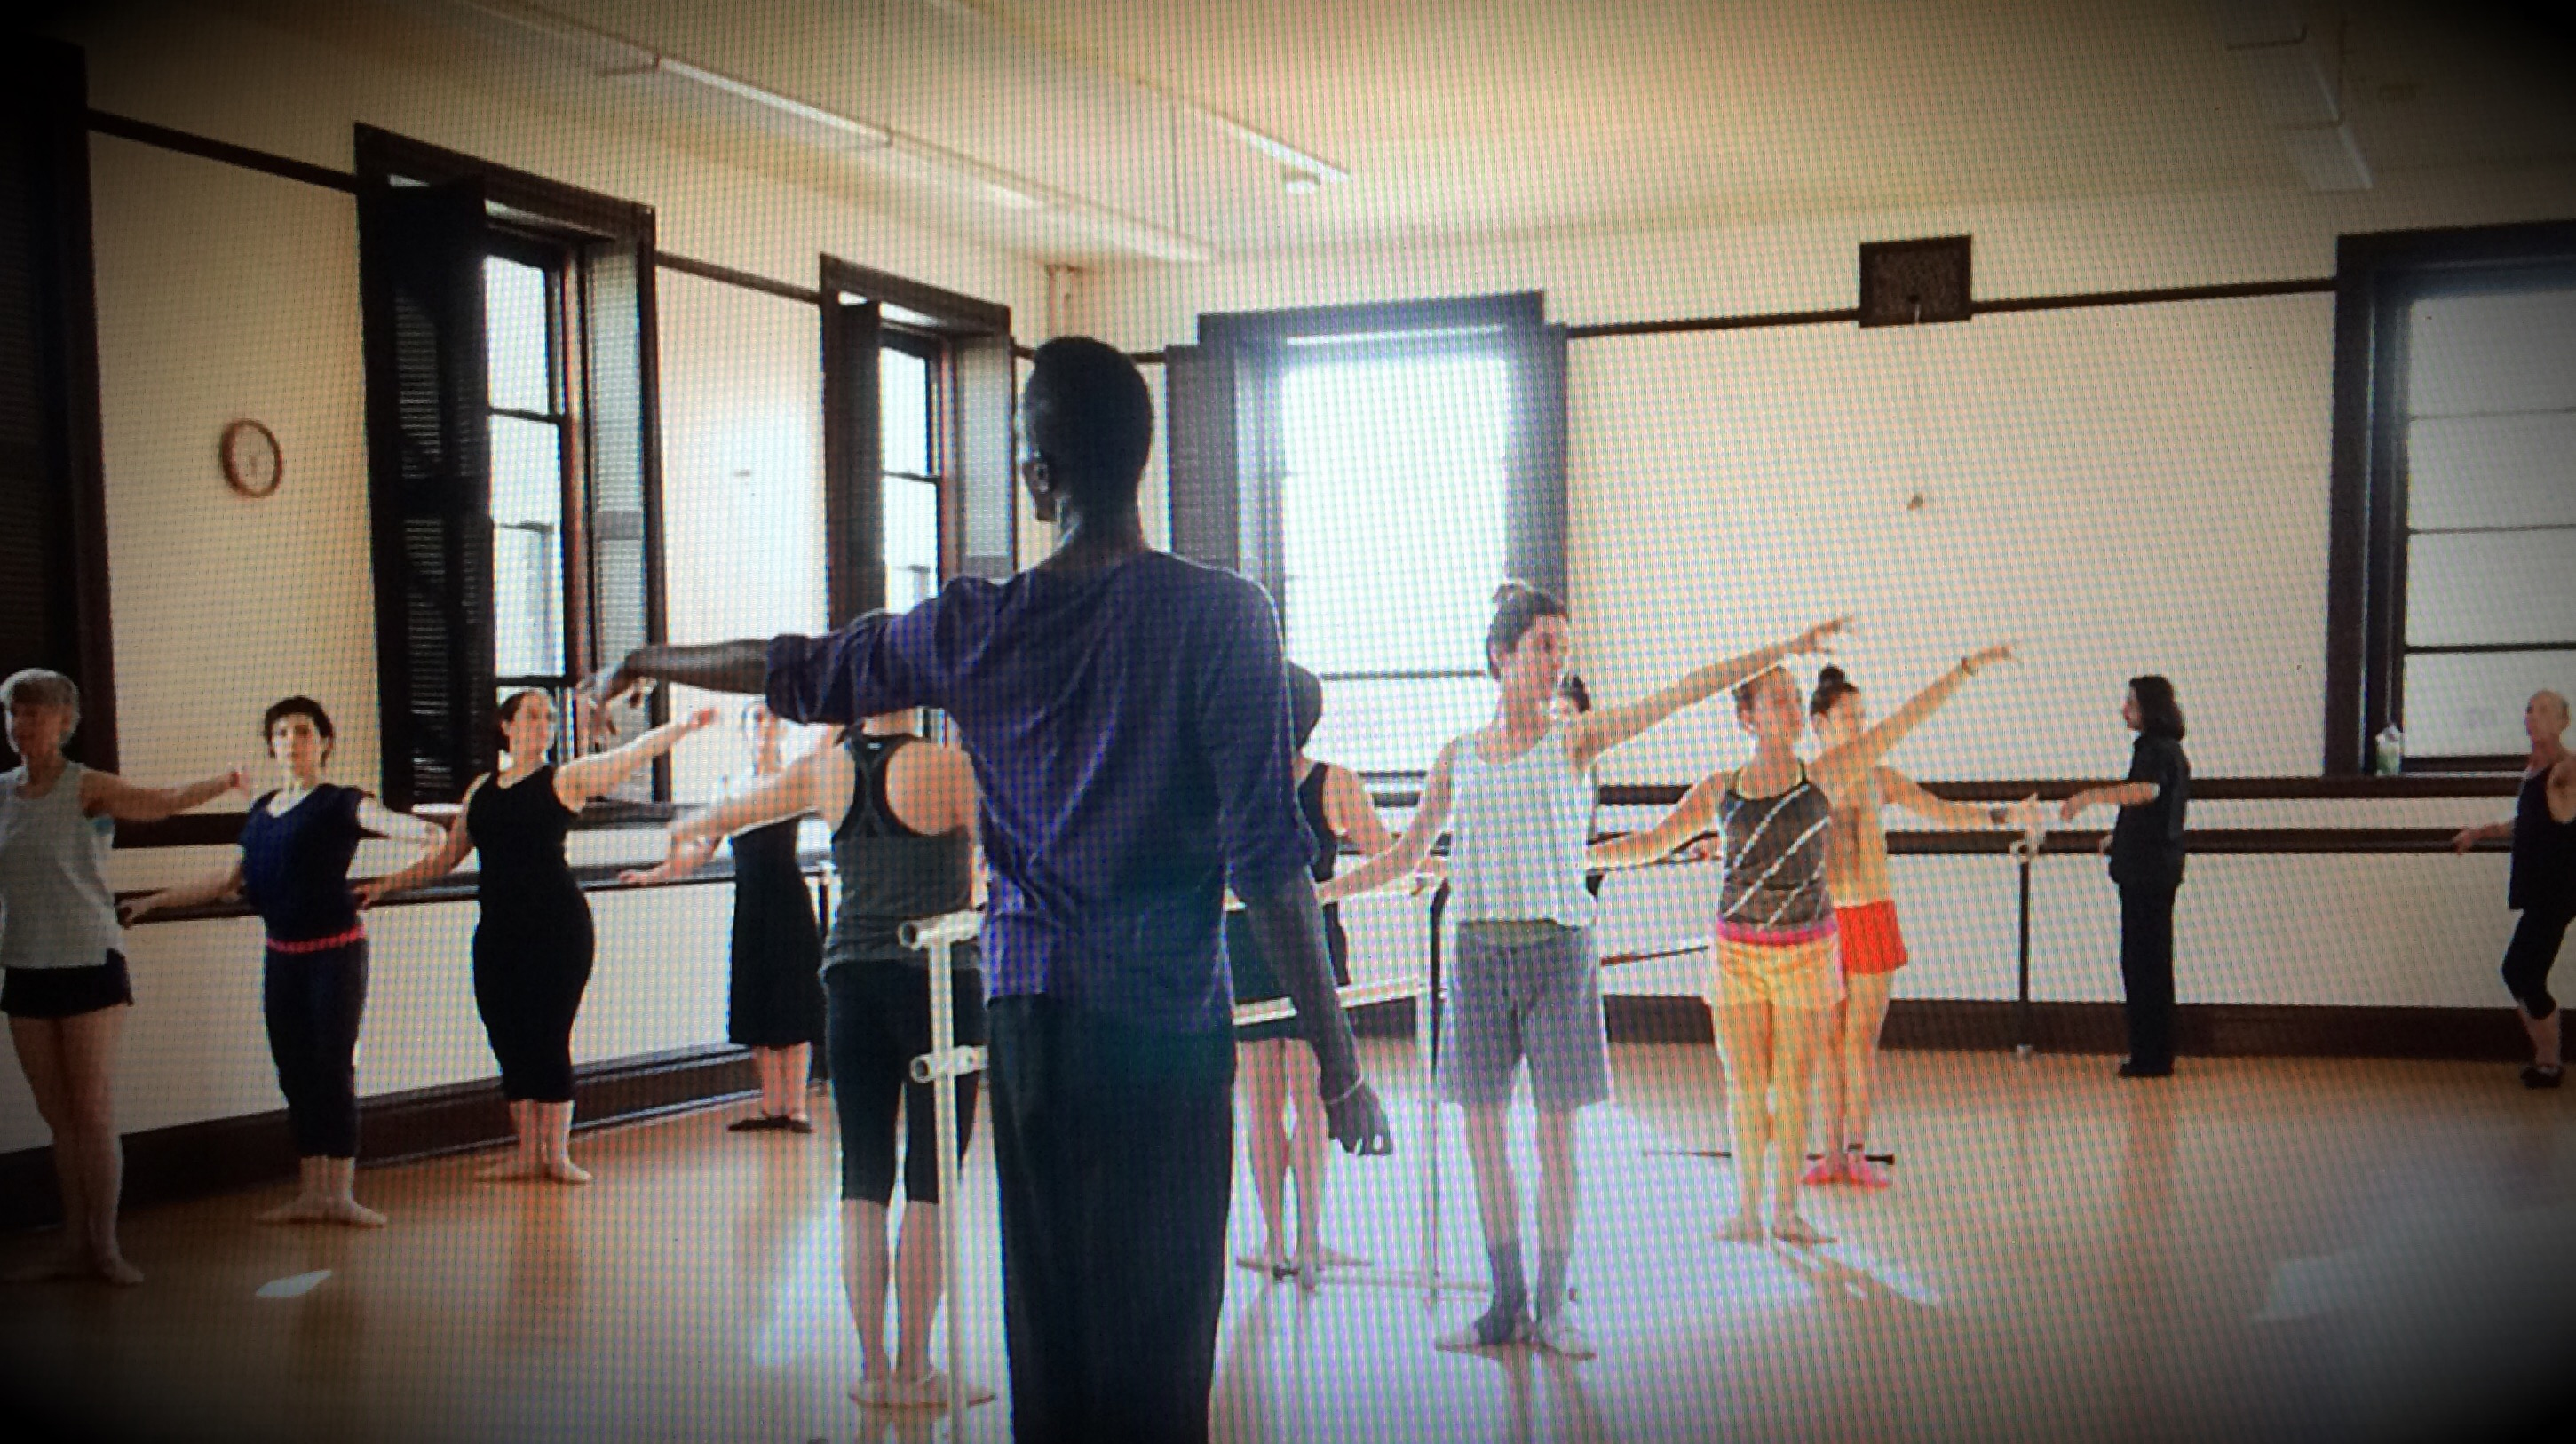 Ballet Mechanics with Ronnie Thomas